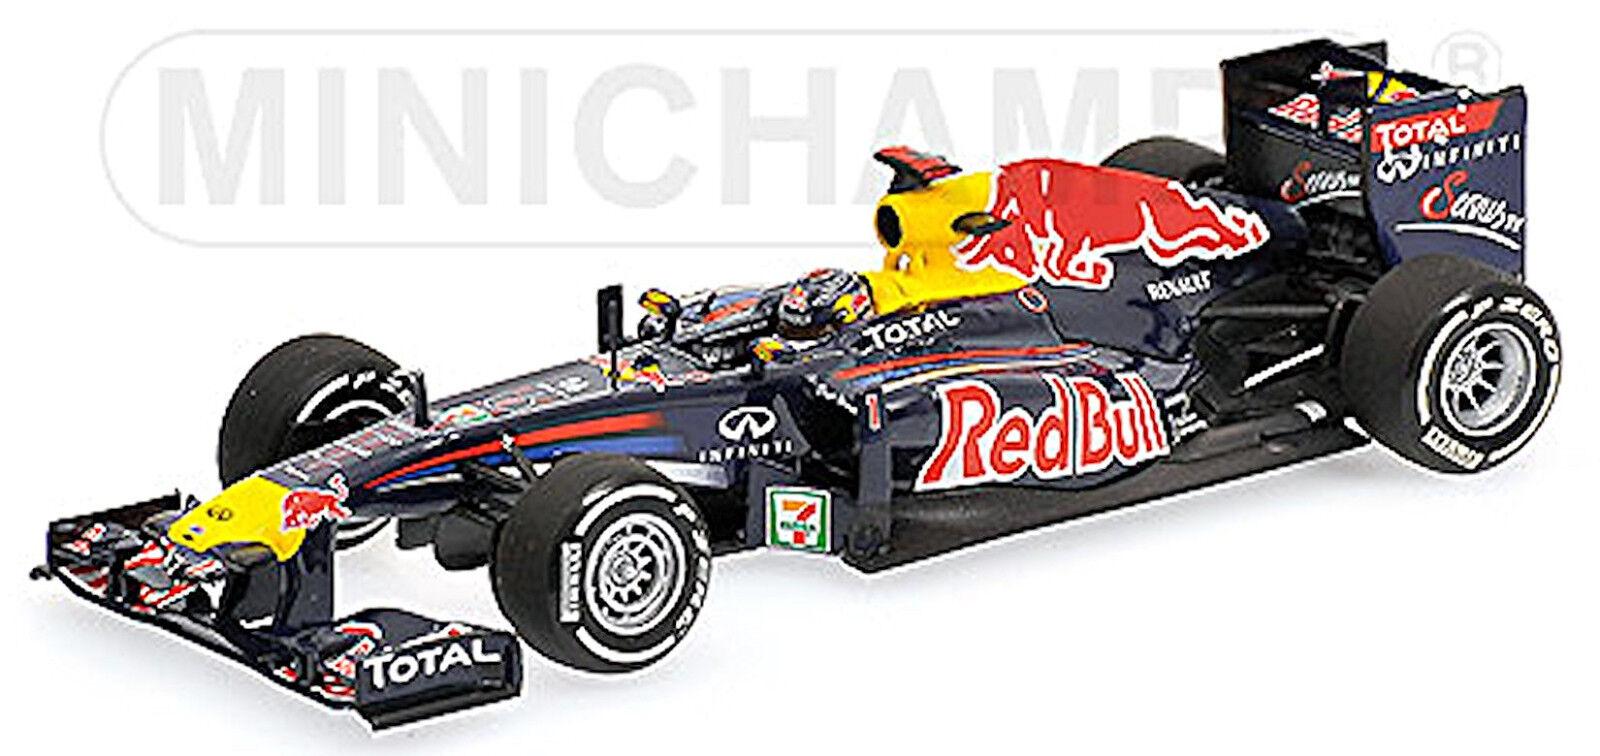 rosso Bull Racing Renault rb7  1 ciabatta WINNER Giappone GP 2011 World Champion 1 43